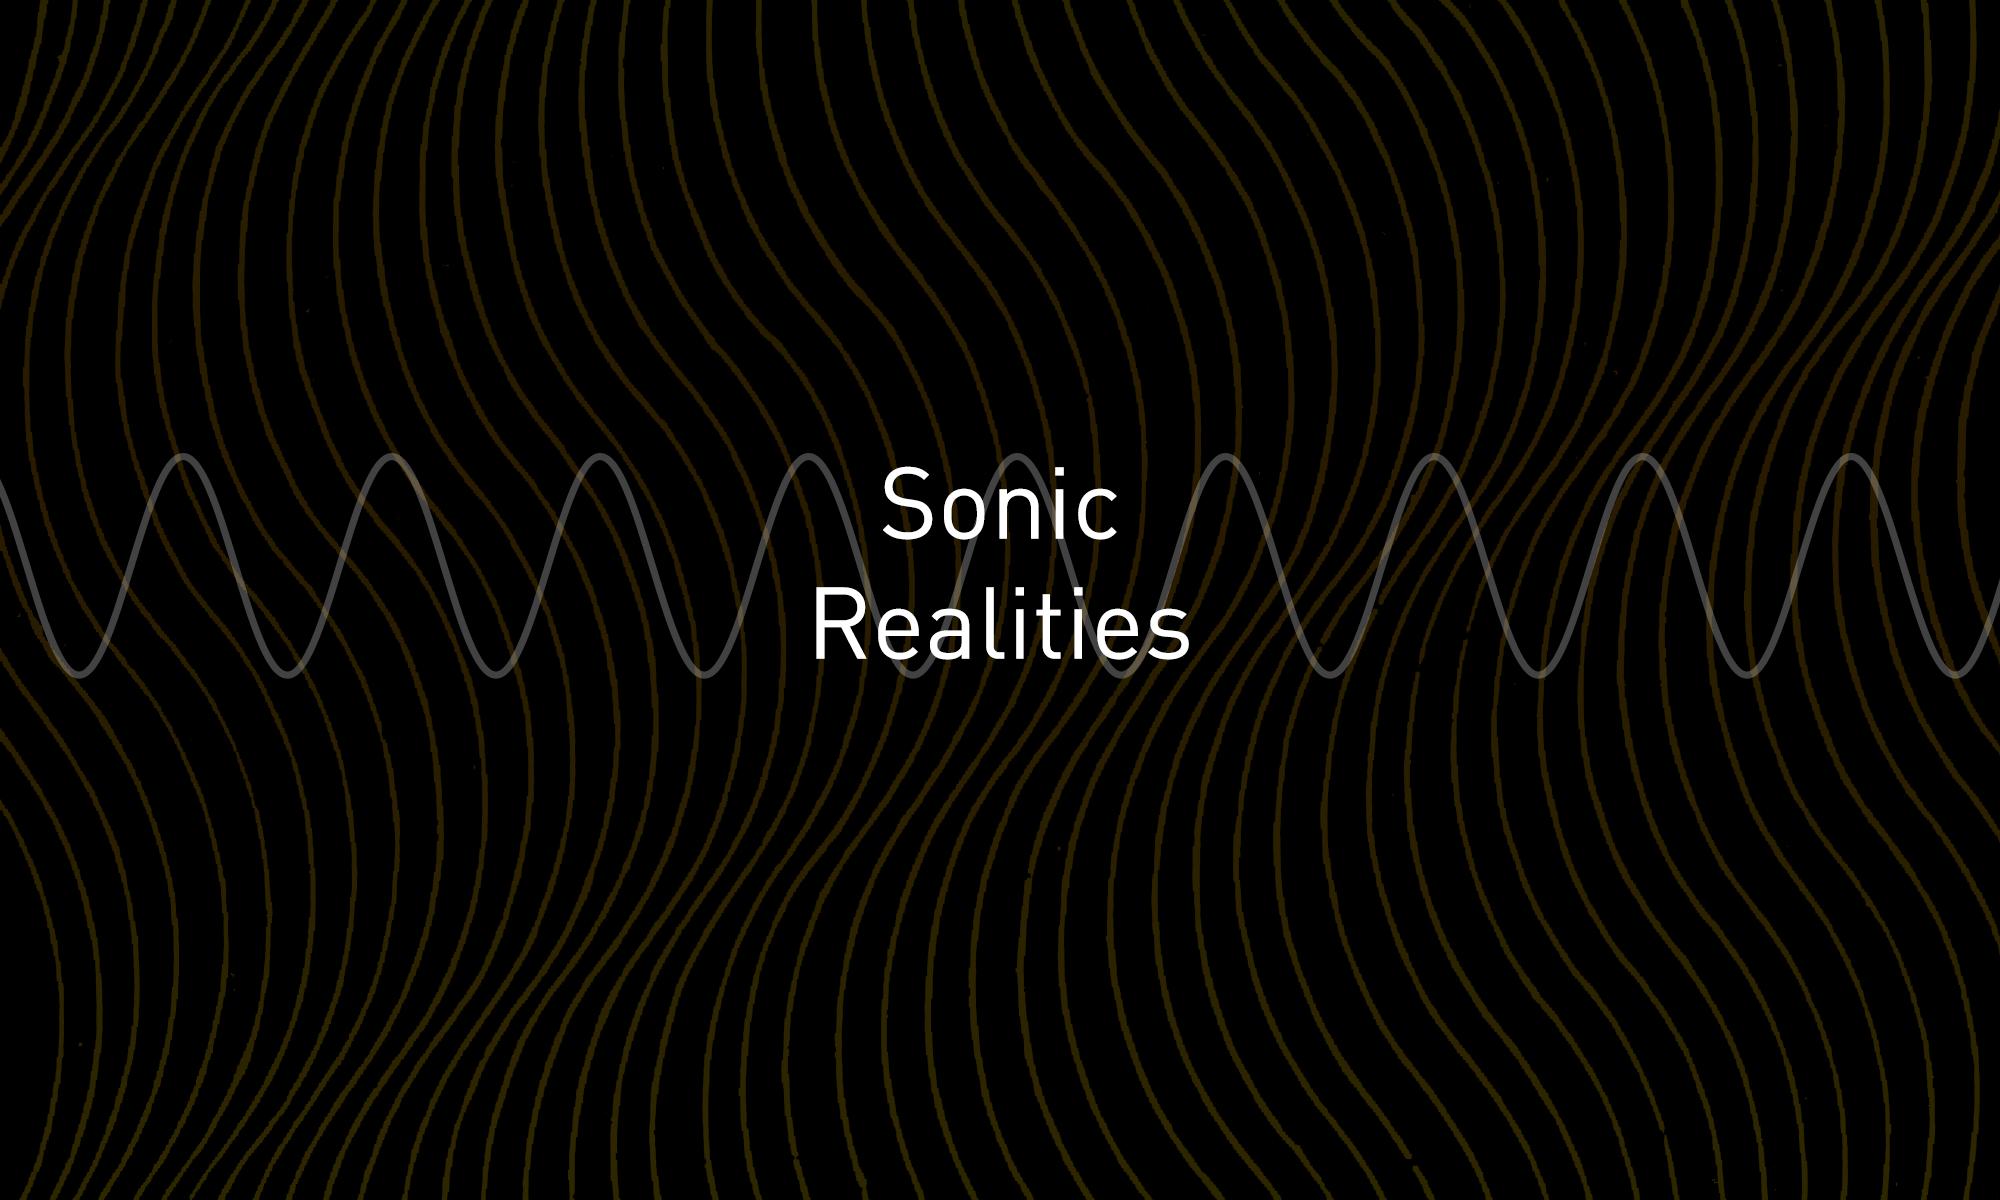 Sonic Realities